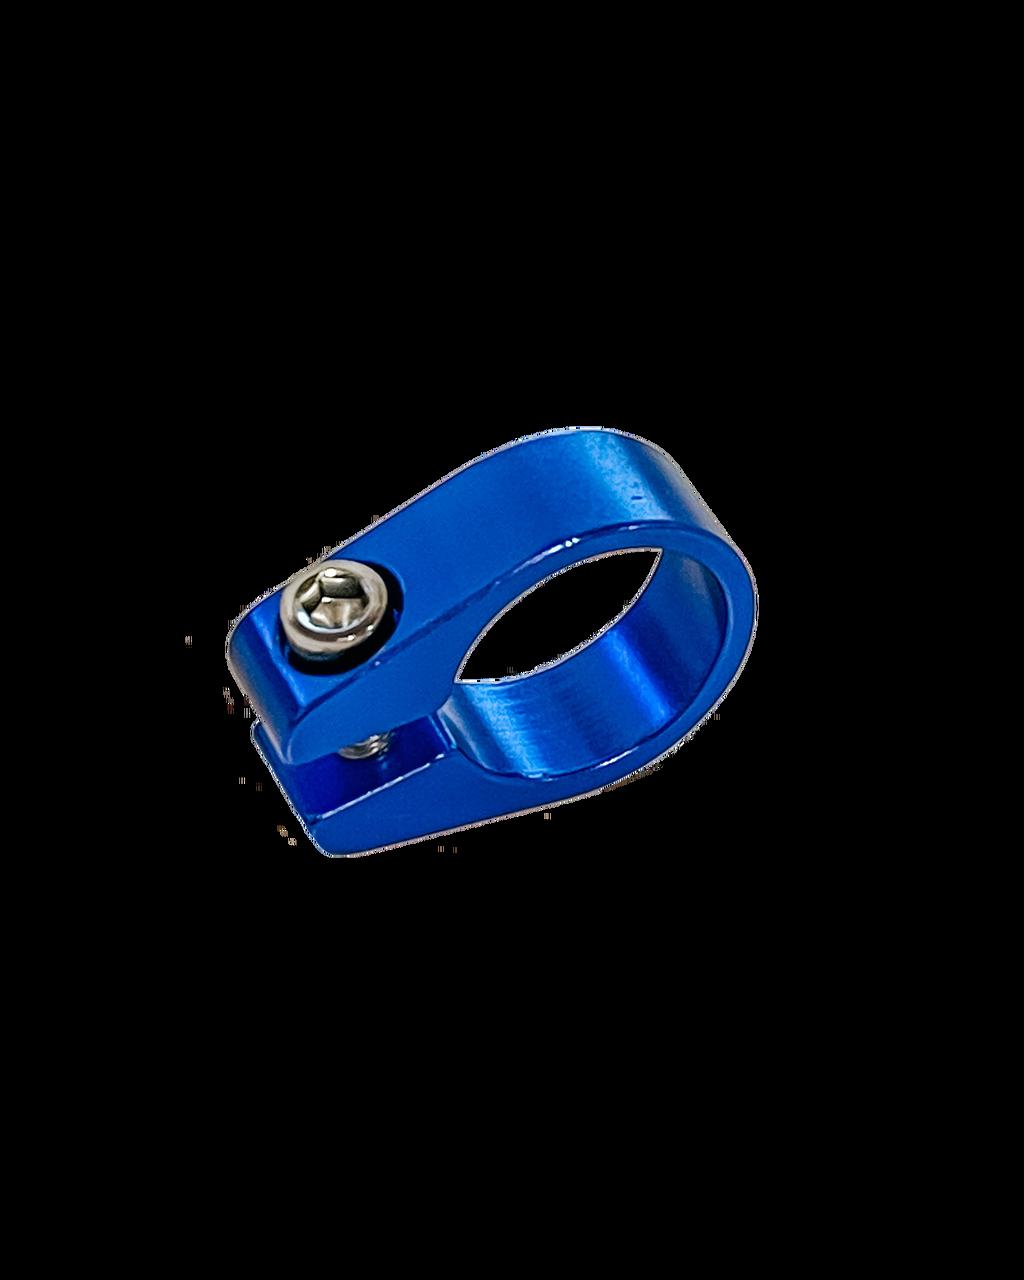 1 Shaft Collar Clamp